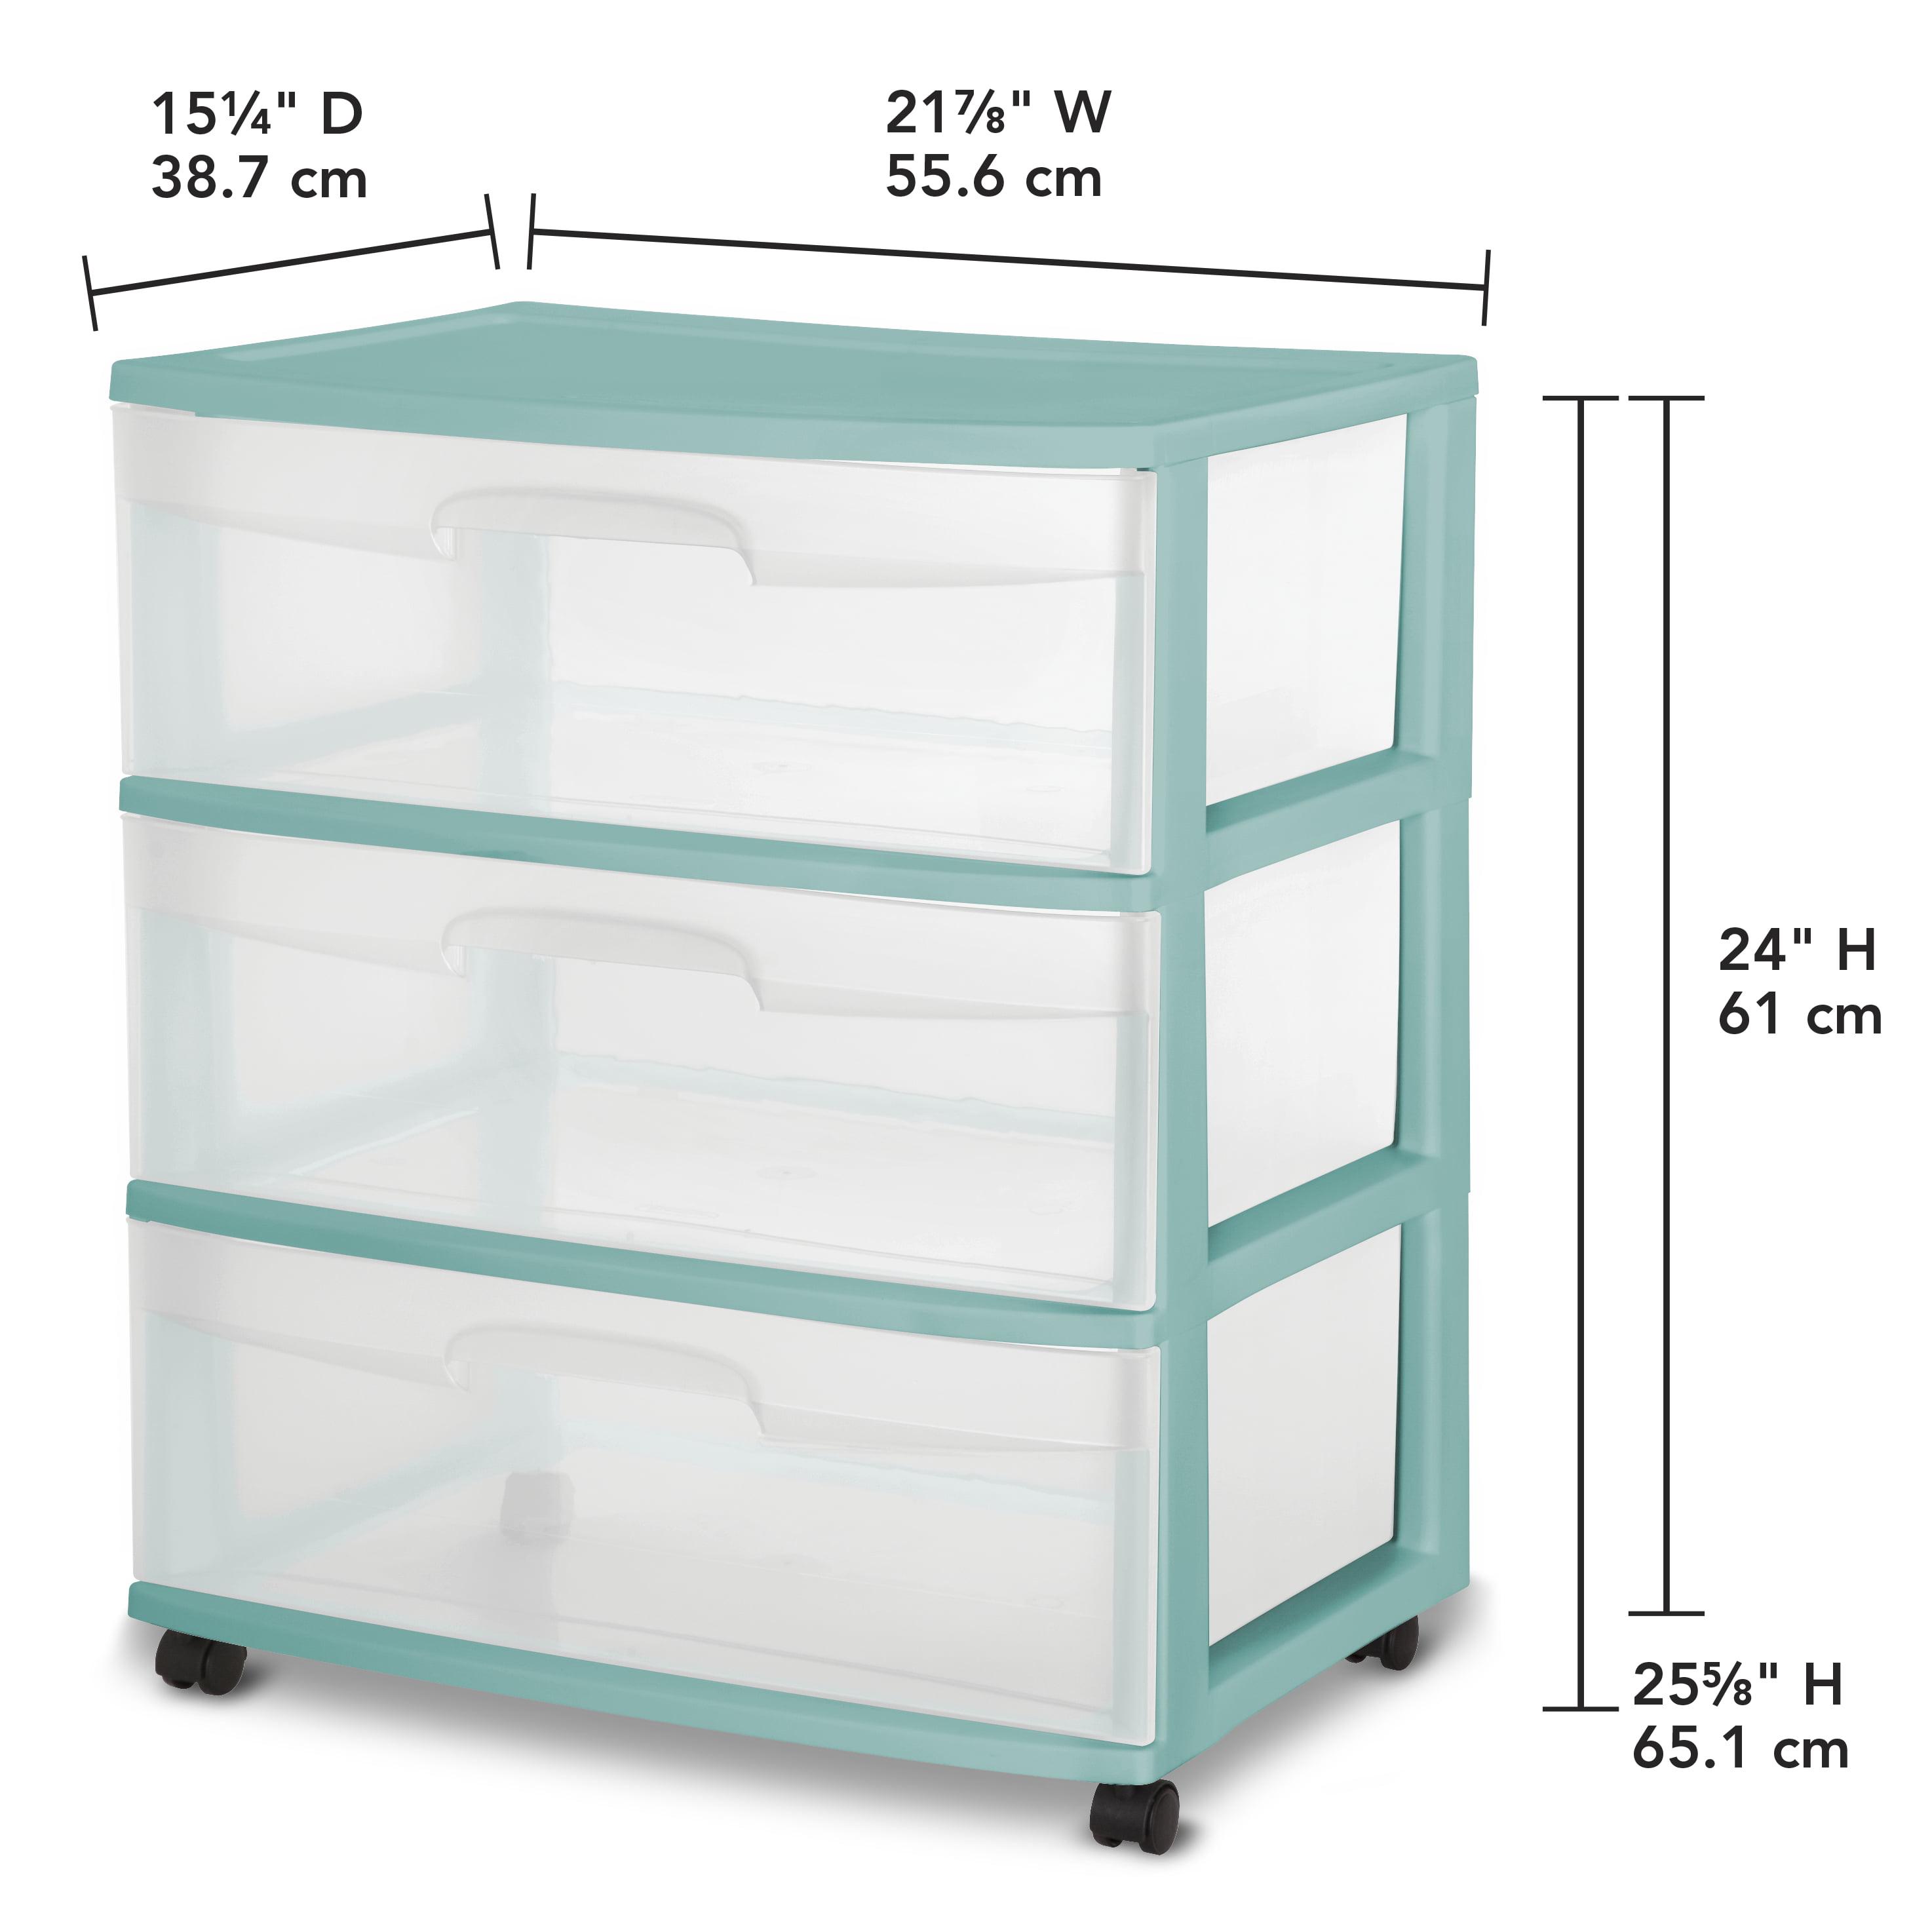 Sterilite 3 Drawer Wide Cart, Fuchsia Supreme, Single - Walmart.com